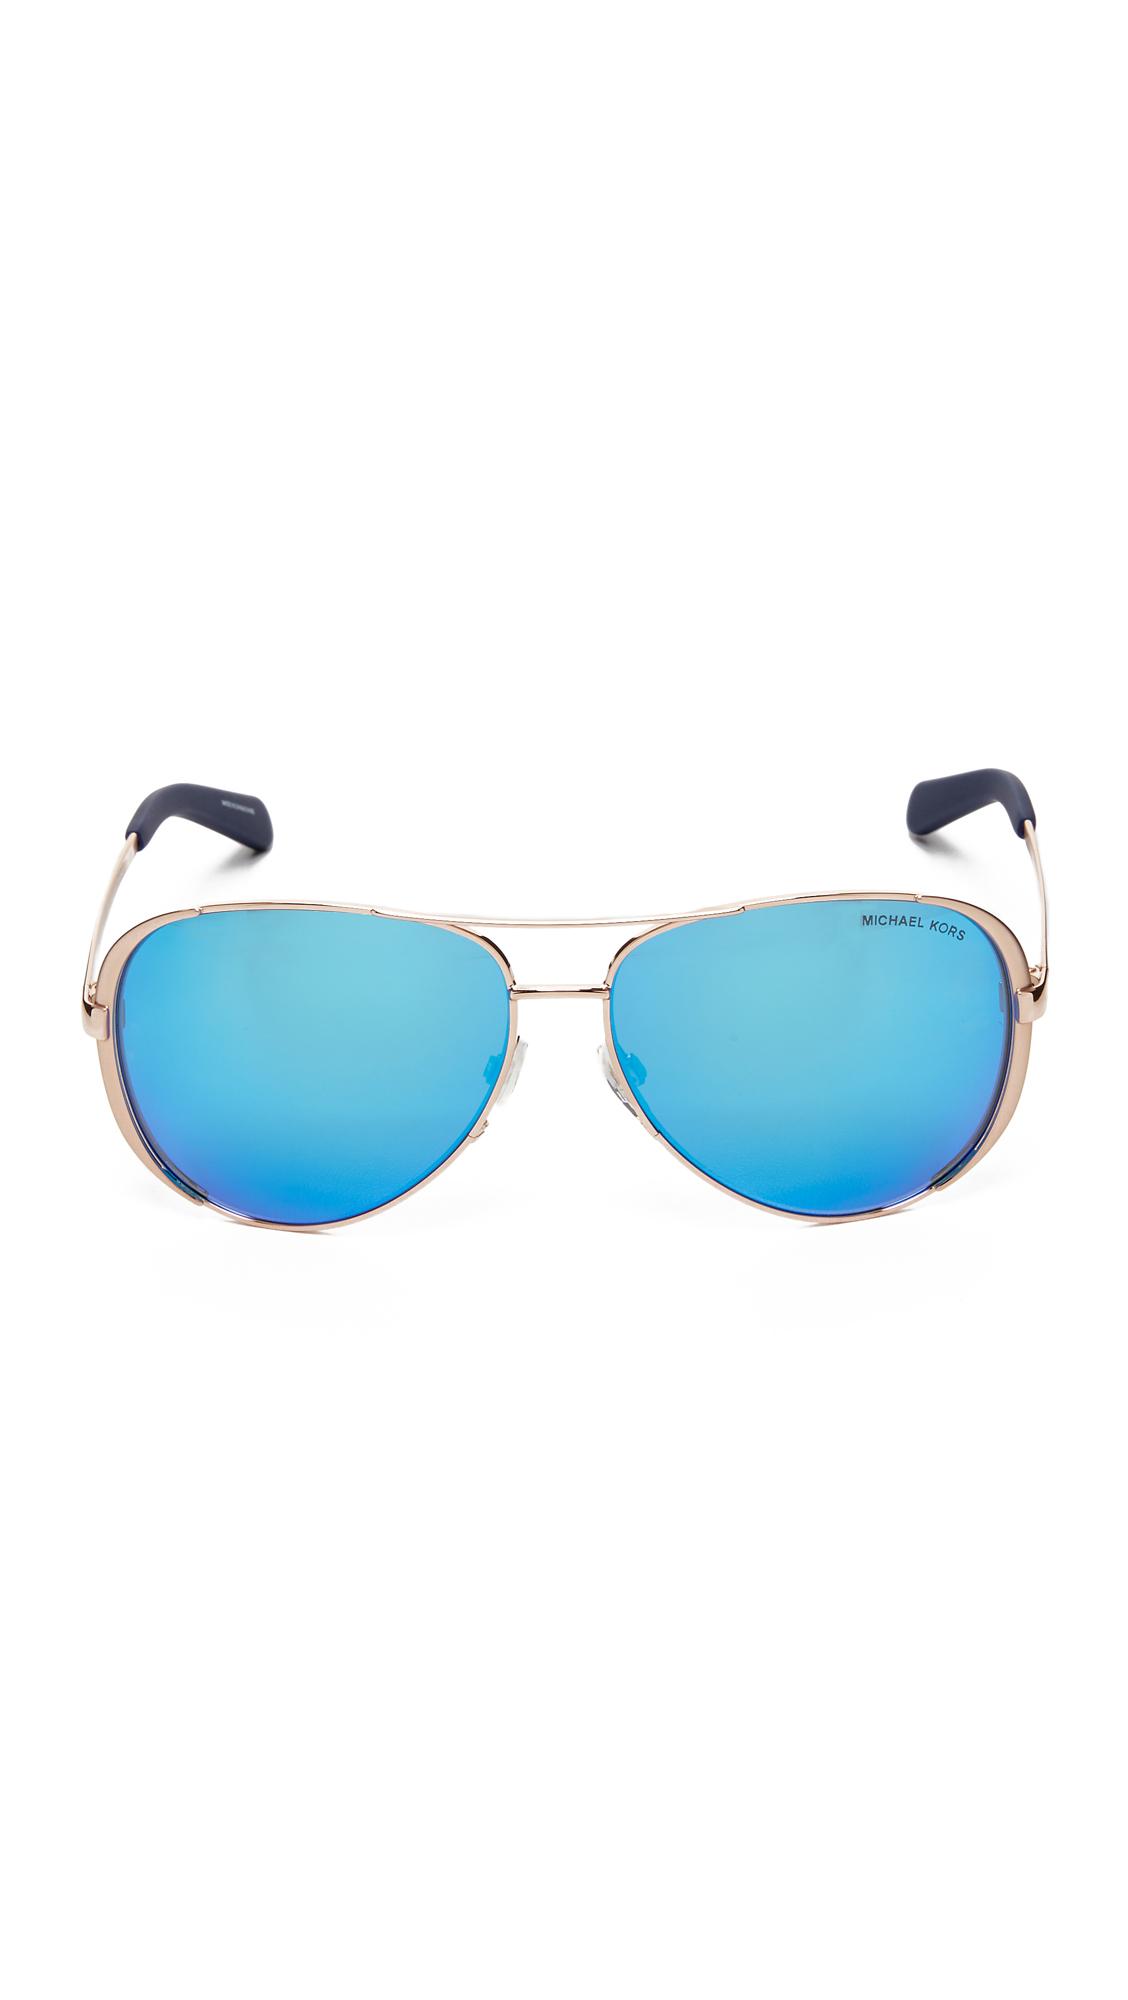 ea36dda866a Lyst - Michael Kors Chelsea Polarized Sunglasses in Metallic